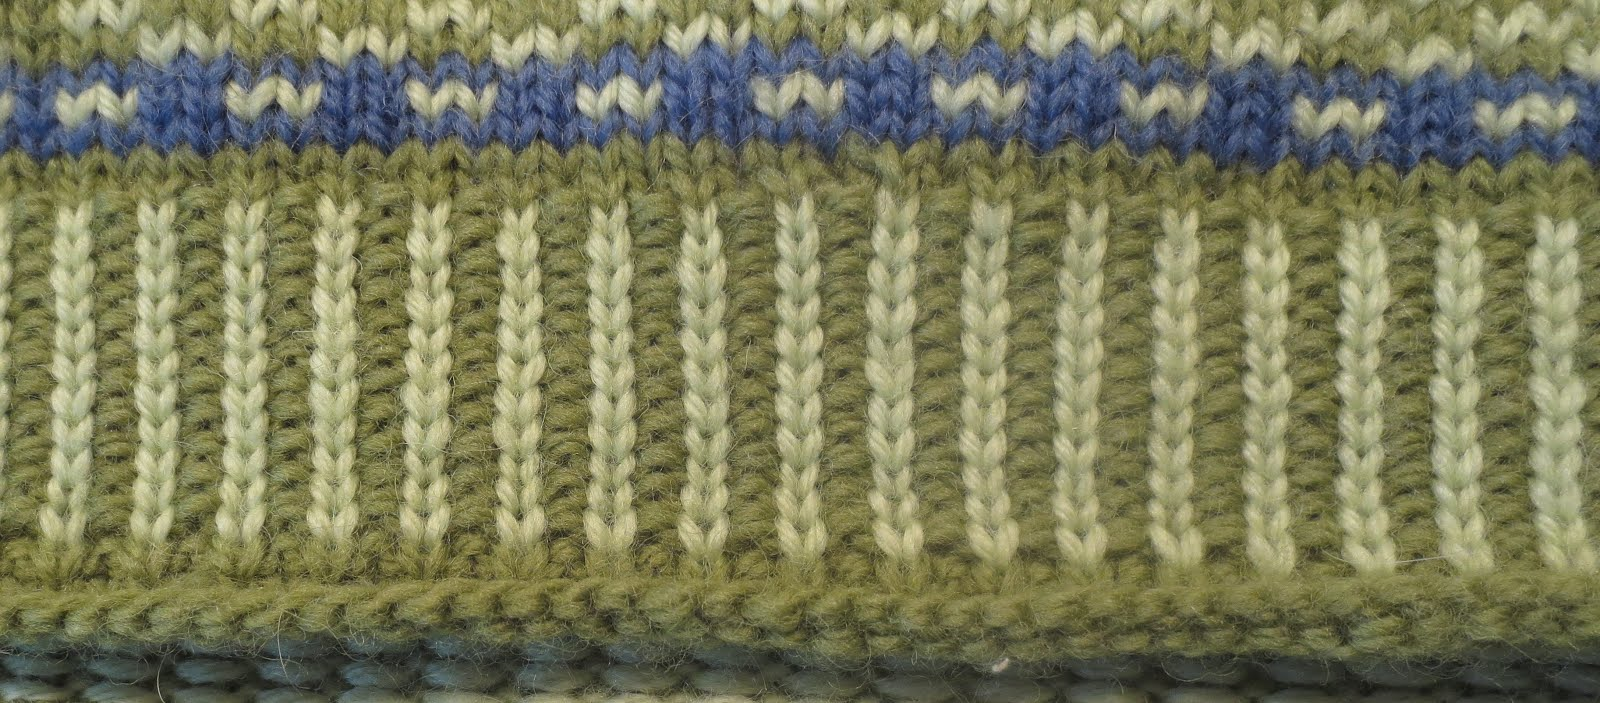 TECHknitting: Corrugated ribbing tricks and tips